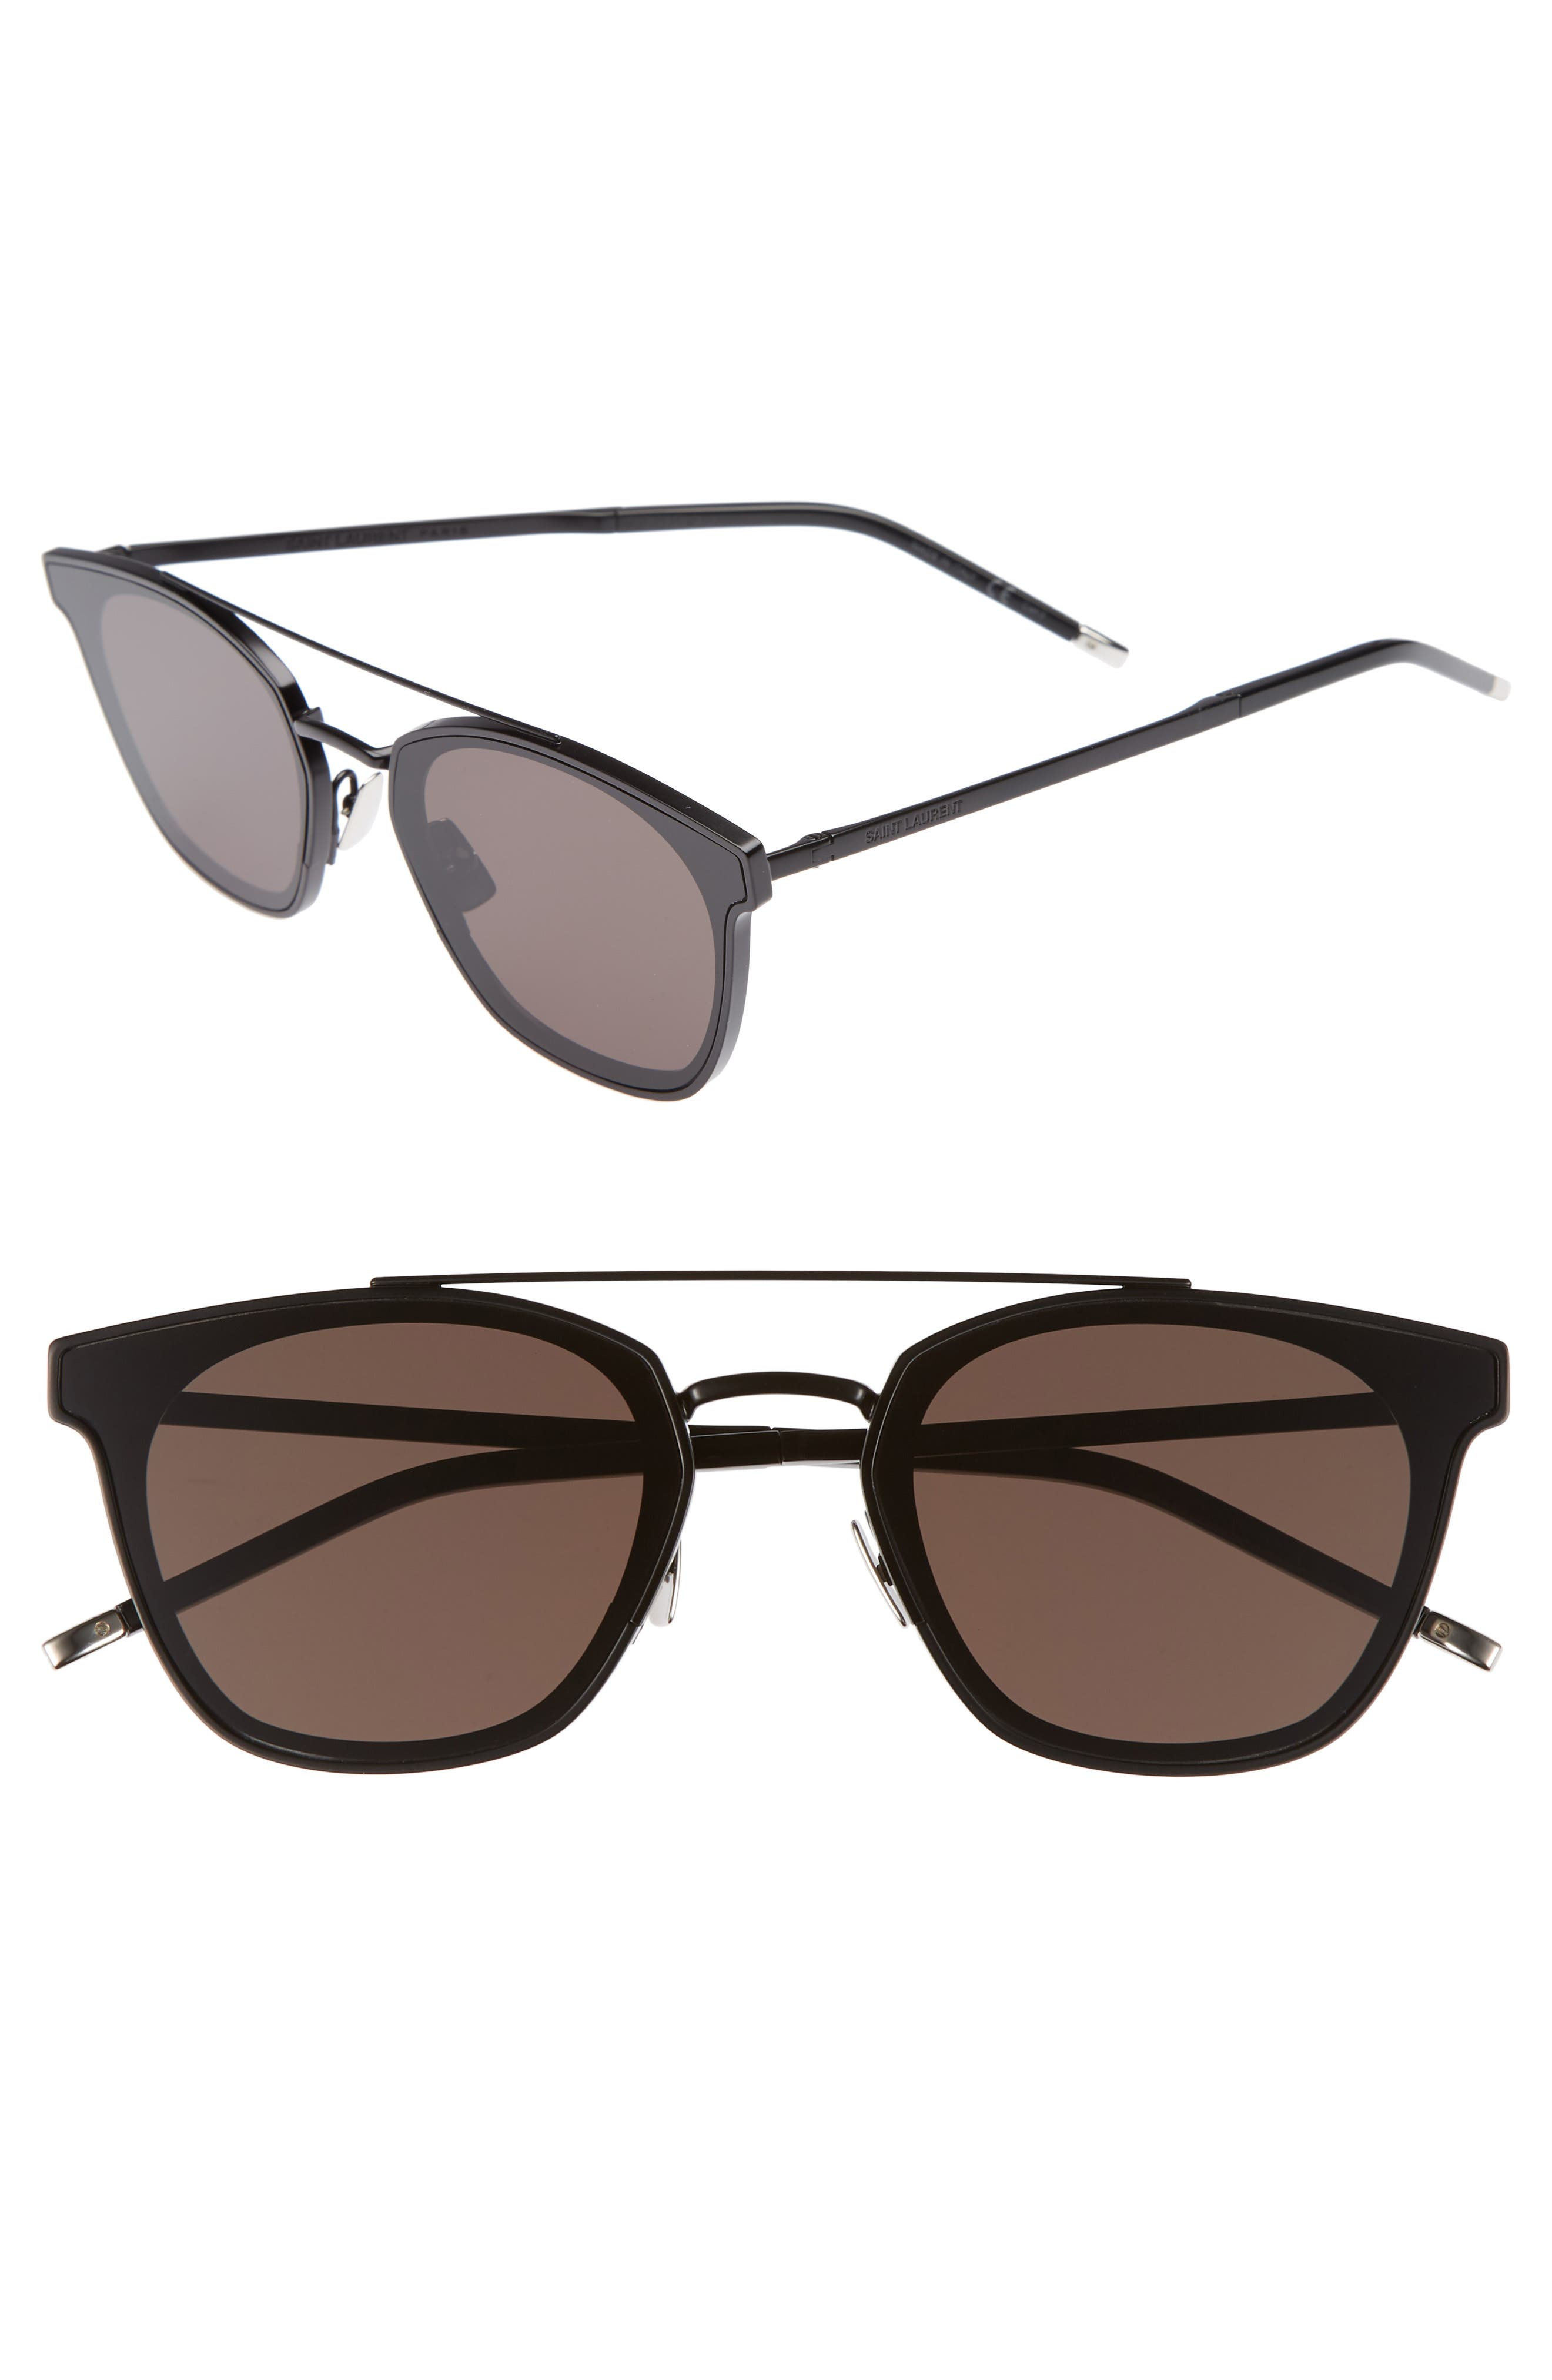 SL 28 61mm Polarized Sunglasses,                         Main,                         color, BLACK